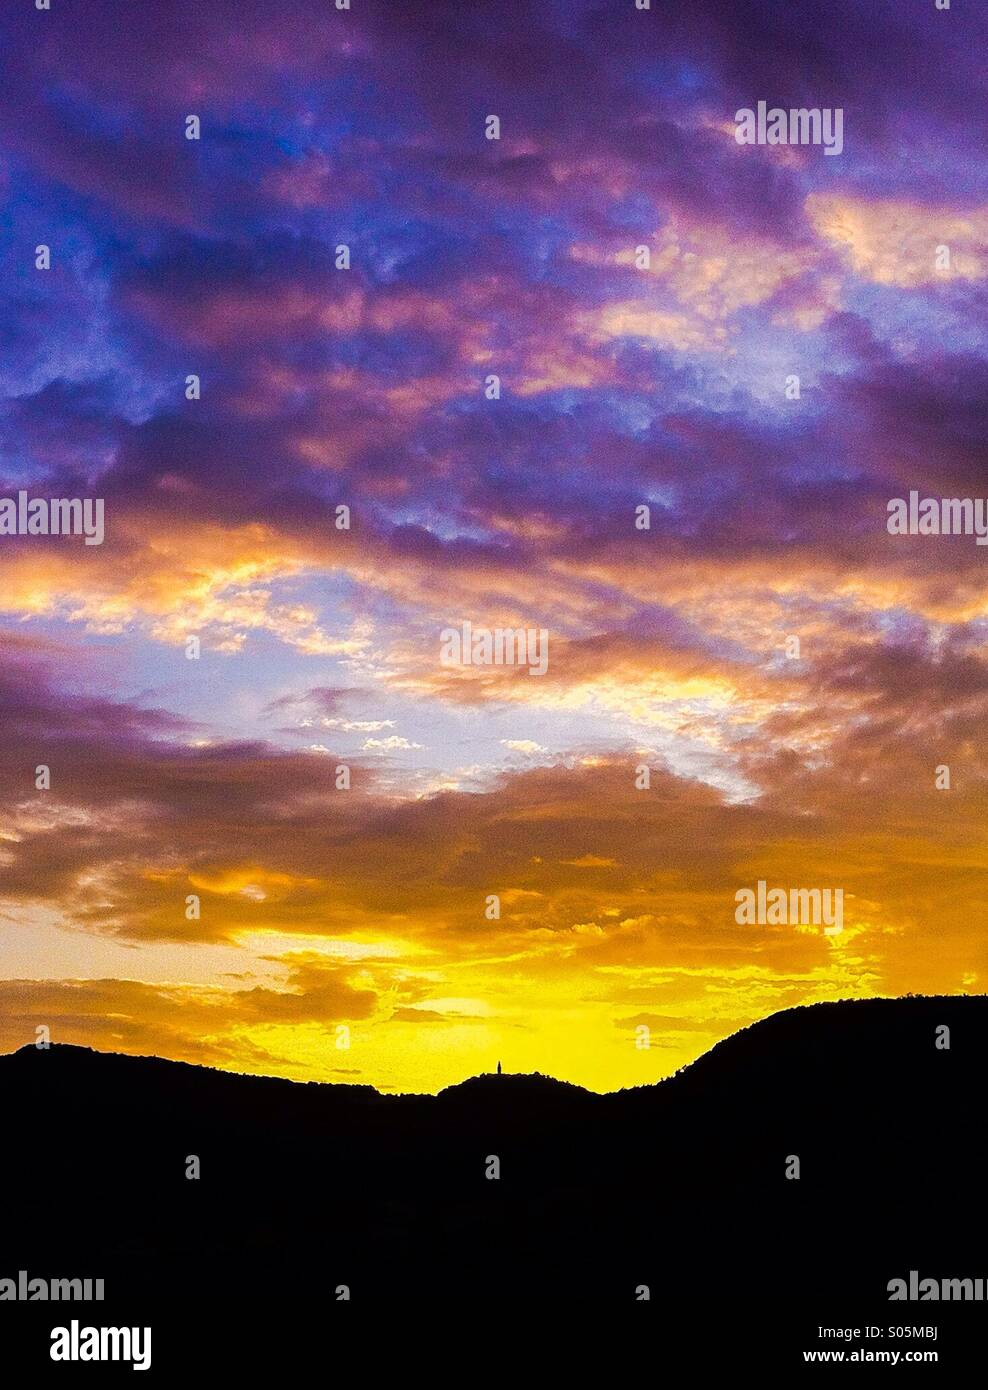 Sunset sky - Stock Image